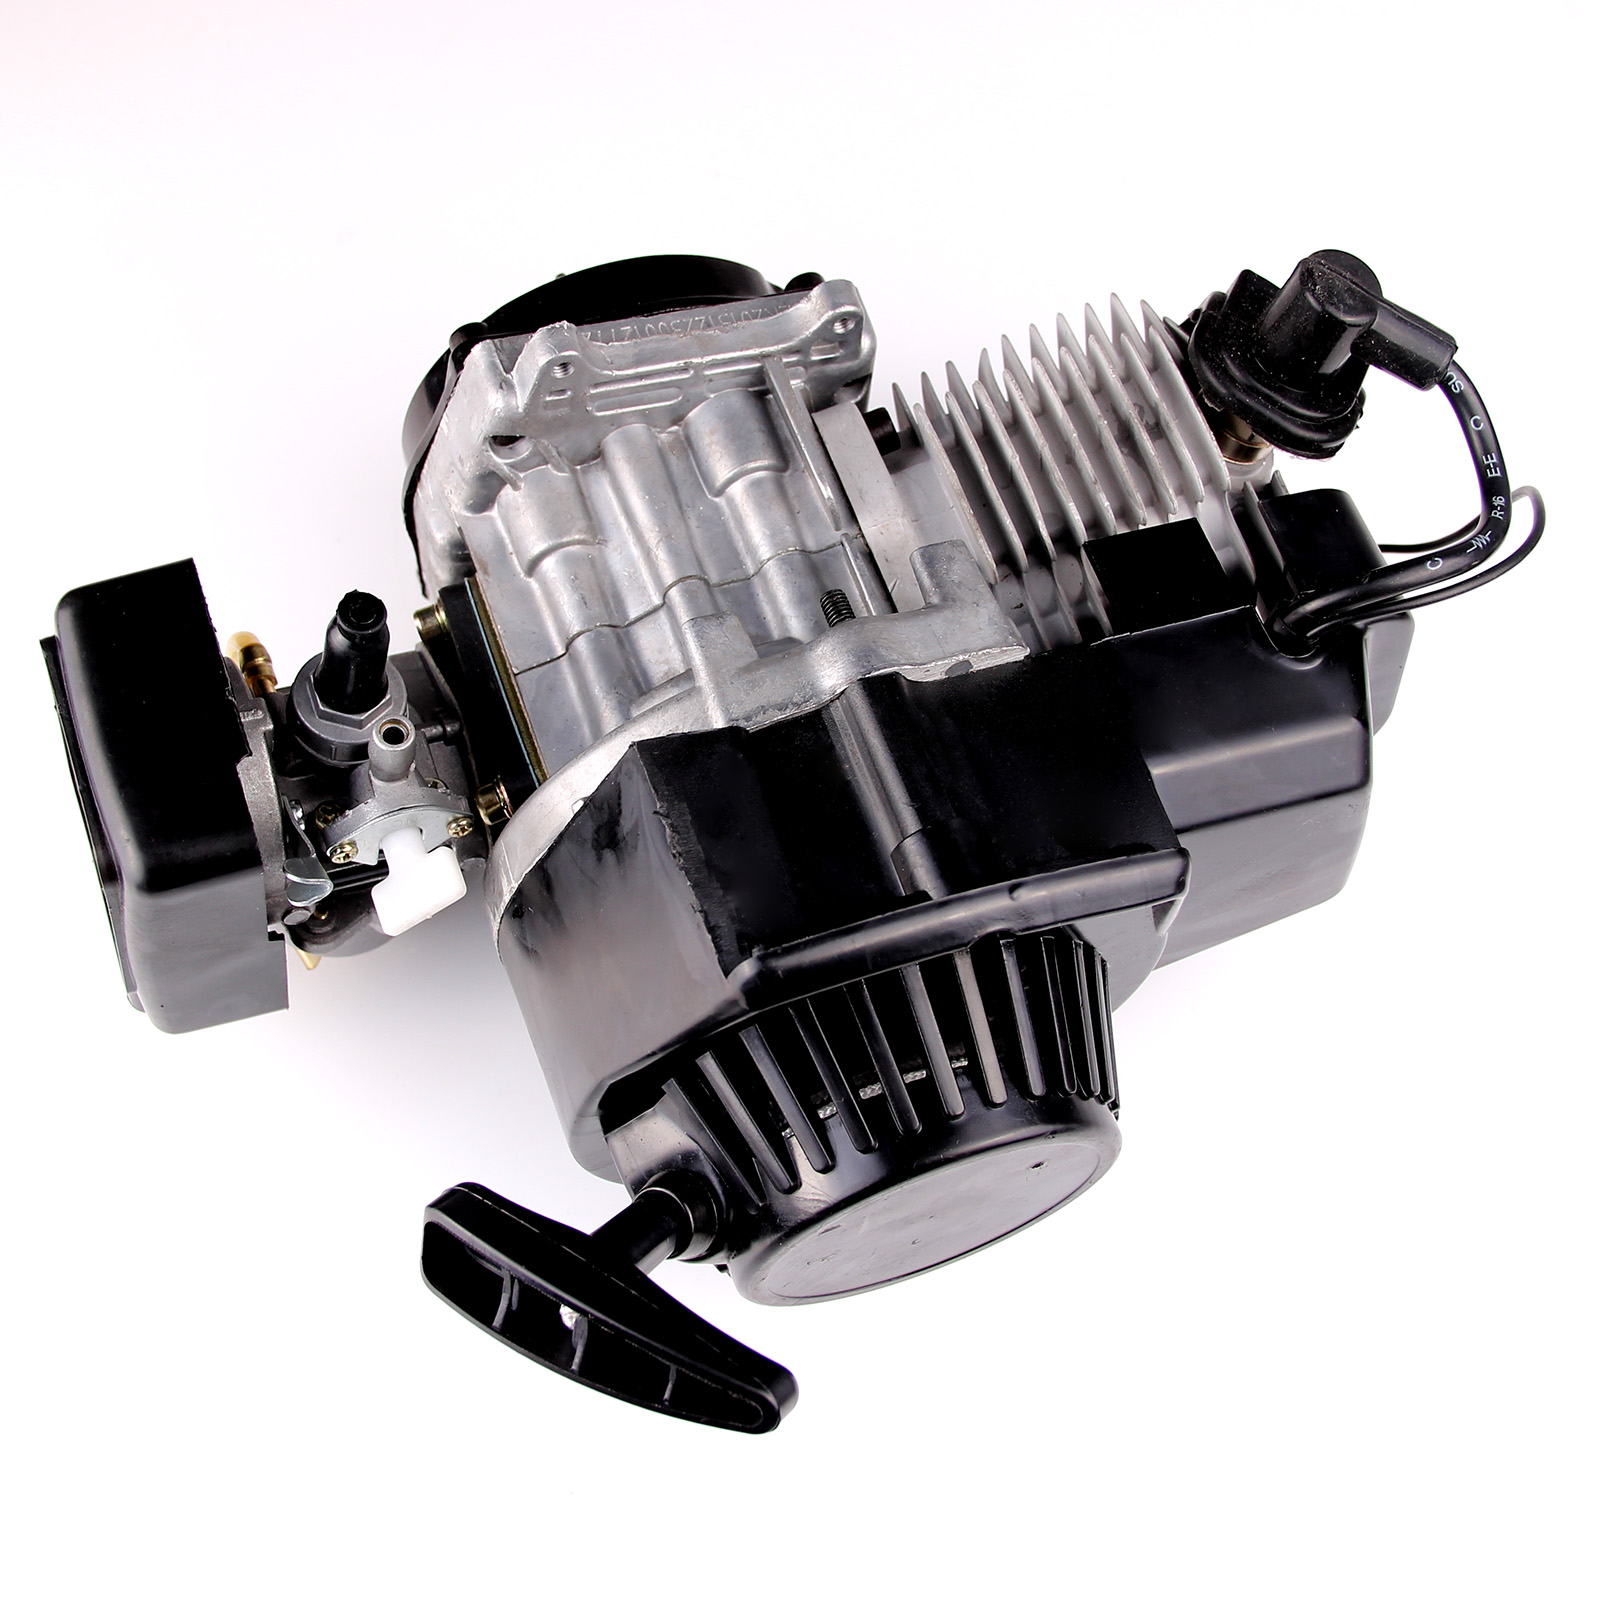 AURELIO TECH 49cc 2-Stroke New Motor Engine Pocket Mini B...